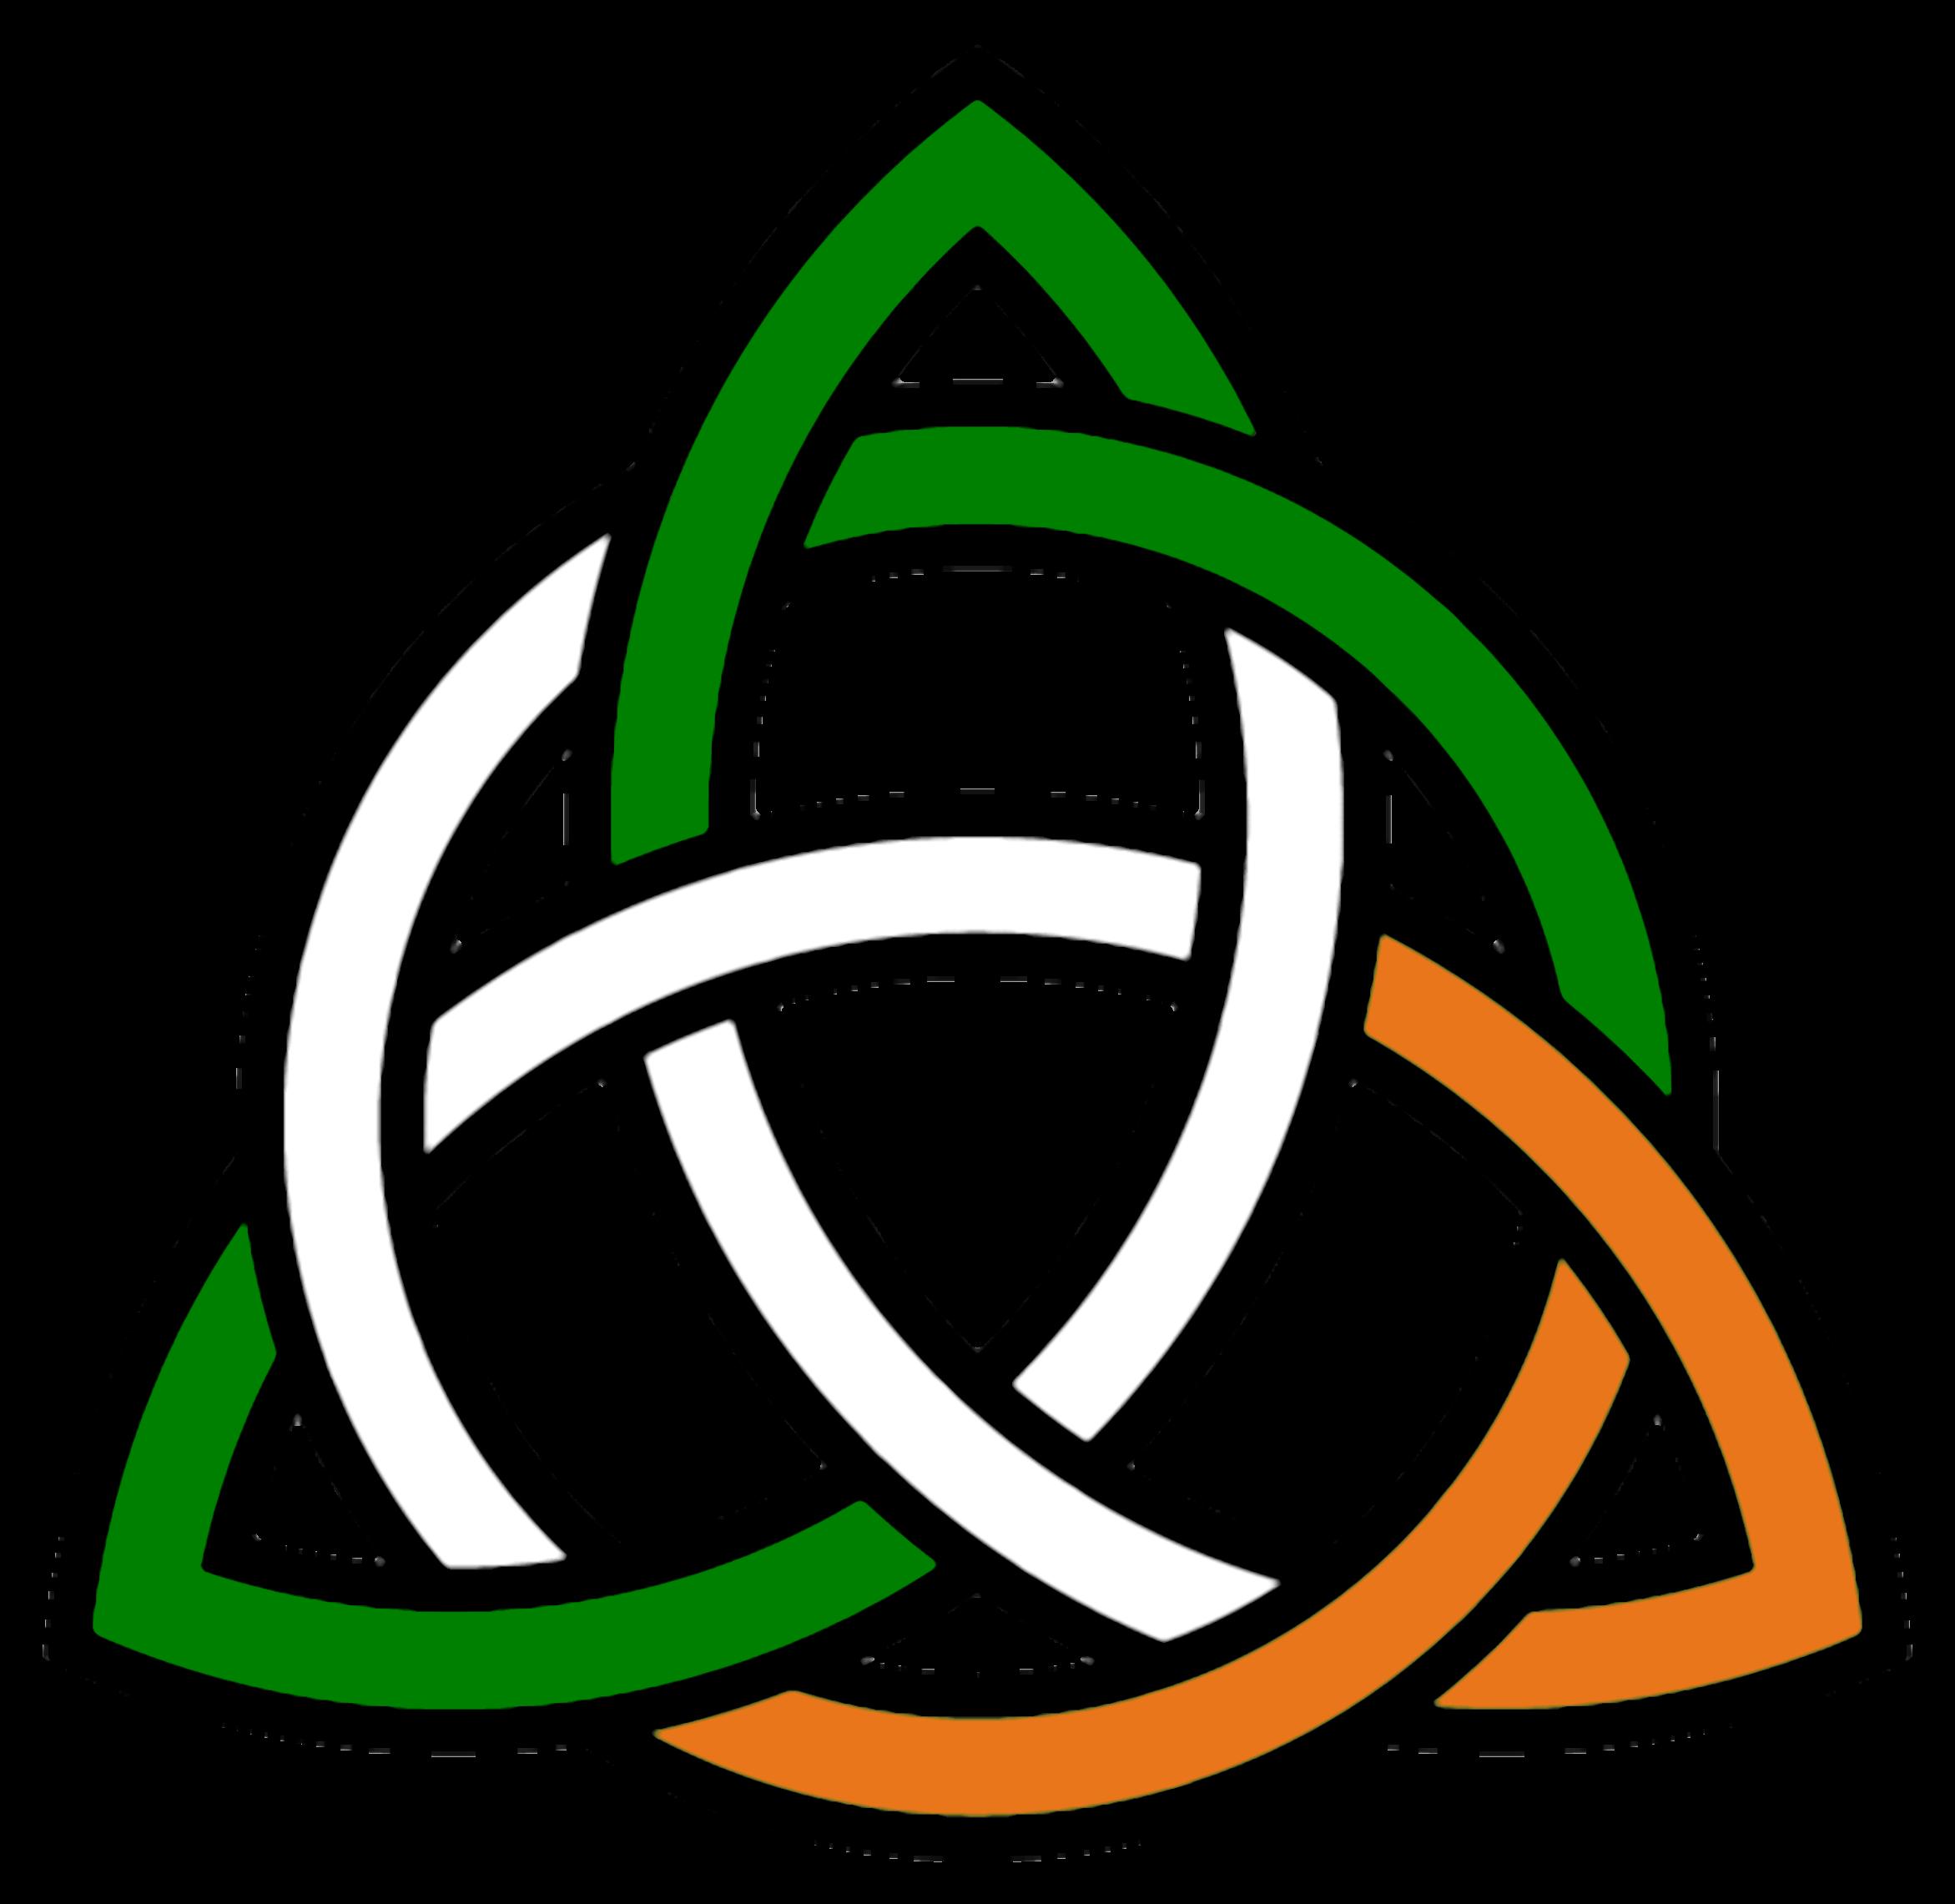 Celt clipart trinity knot Clipart Symbol Irish Clipart Symbol